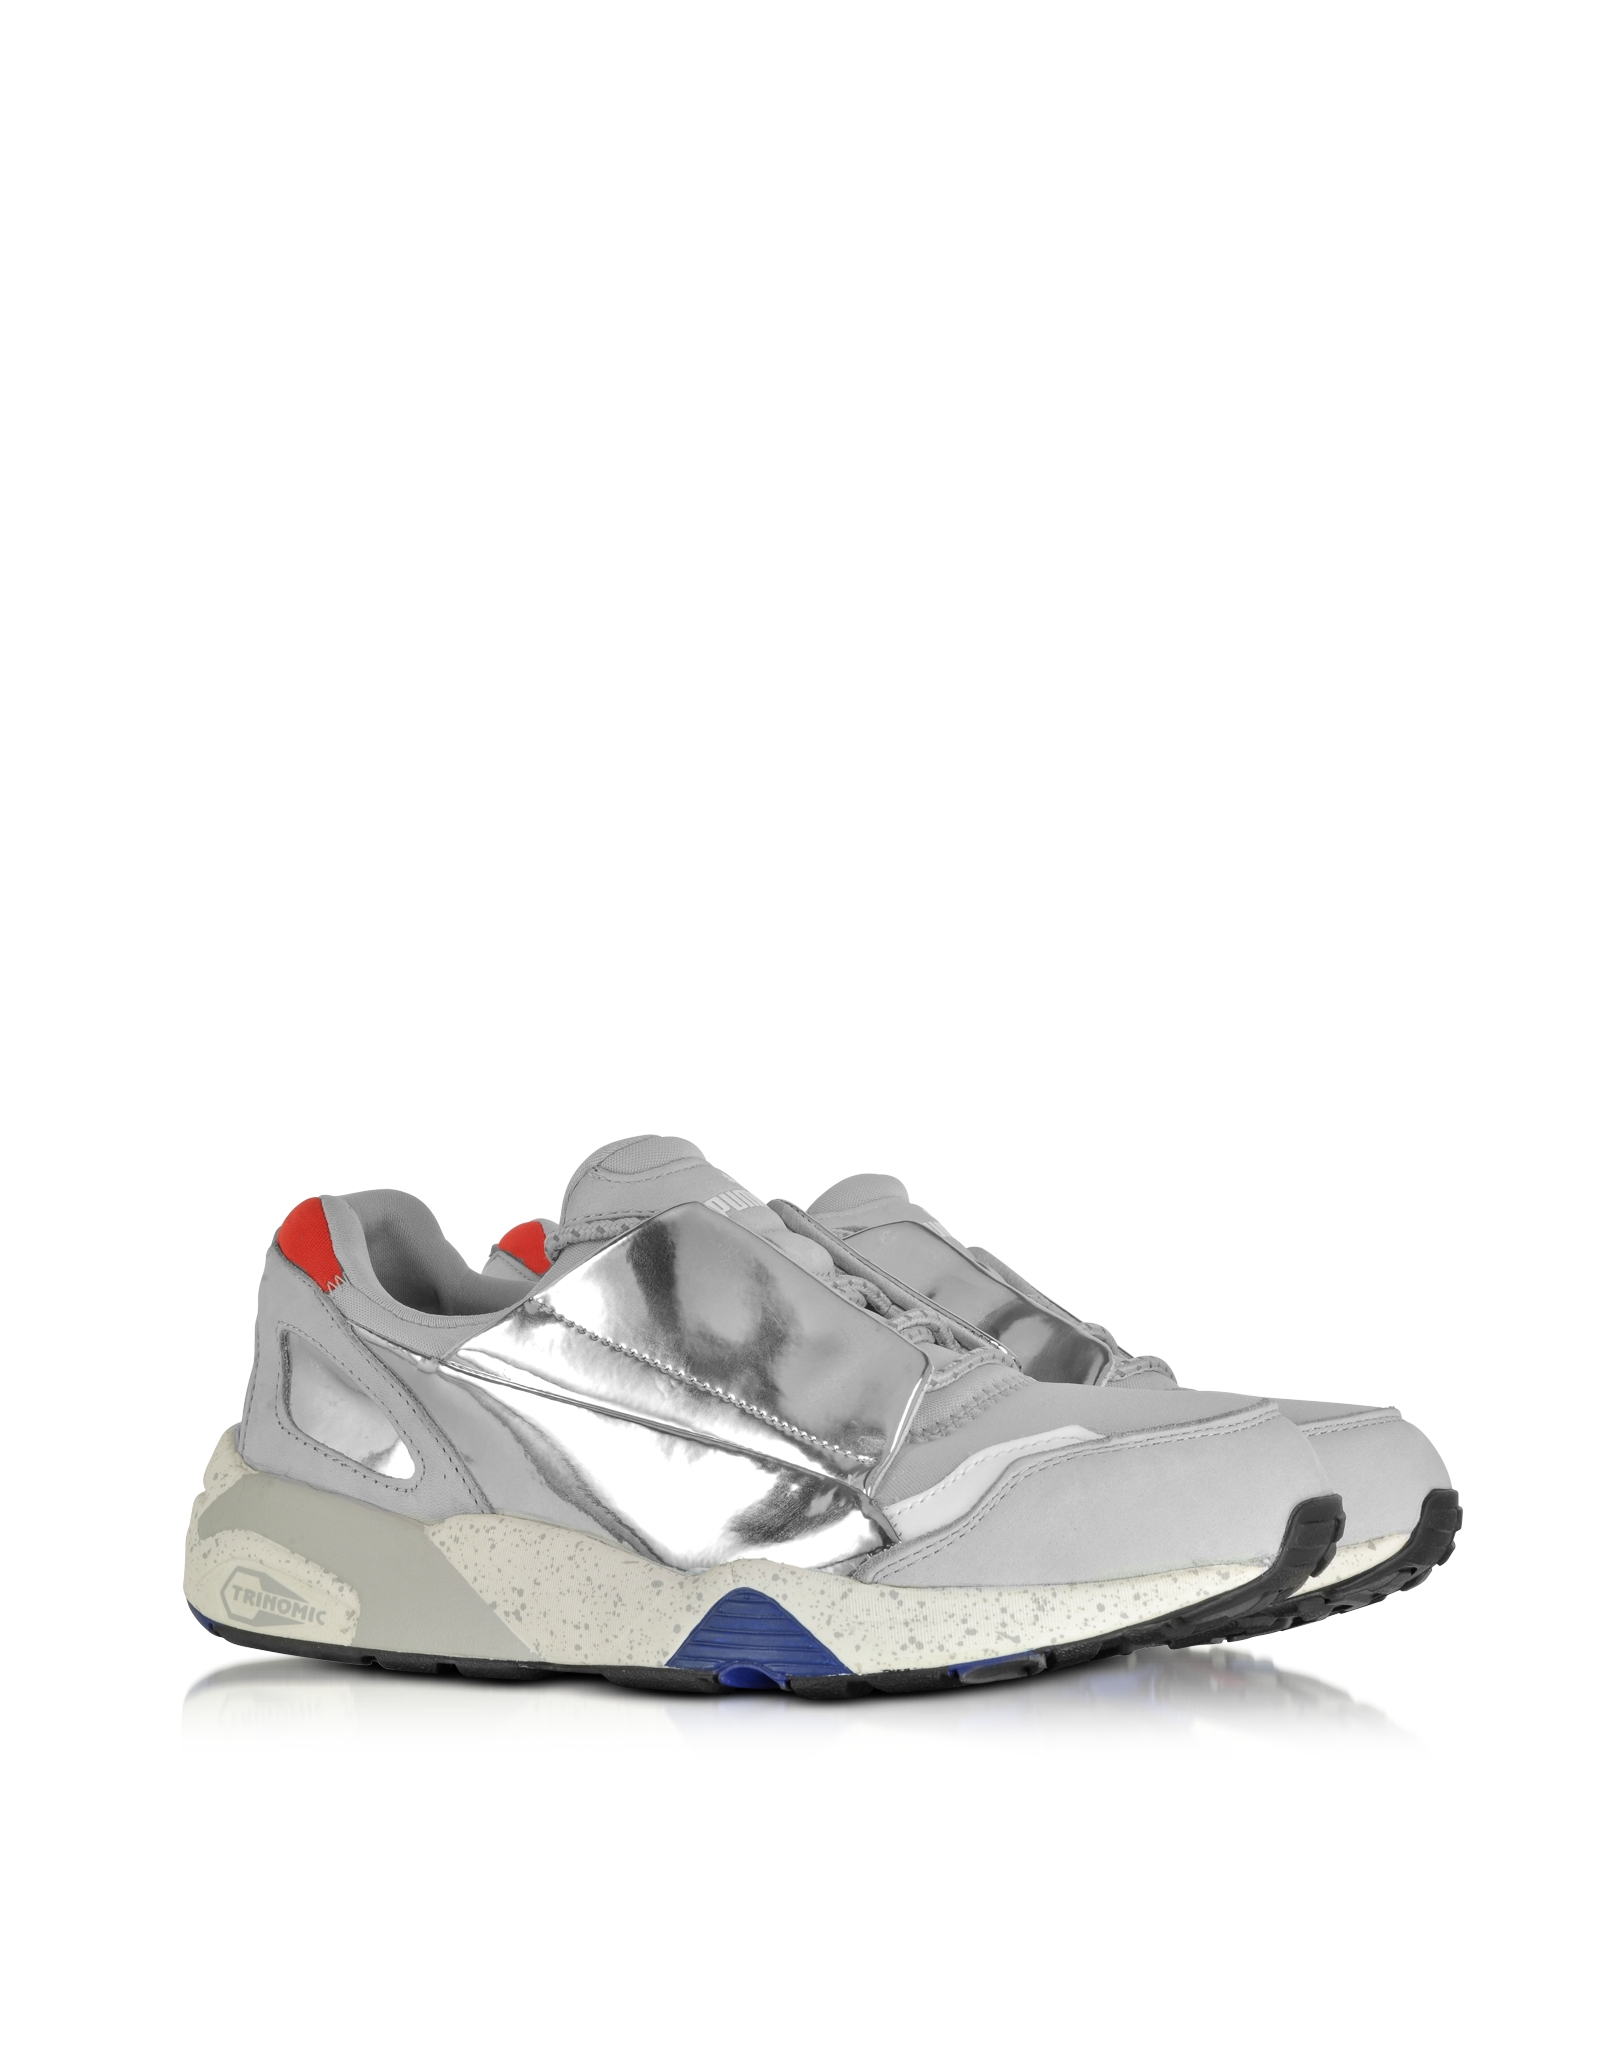 Puma X Alexander Mcqueen Sneakers consumabulbs.co.uk